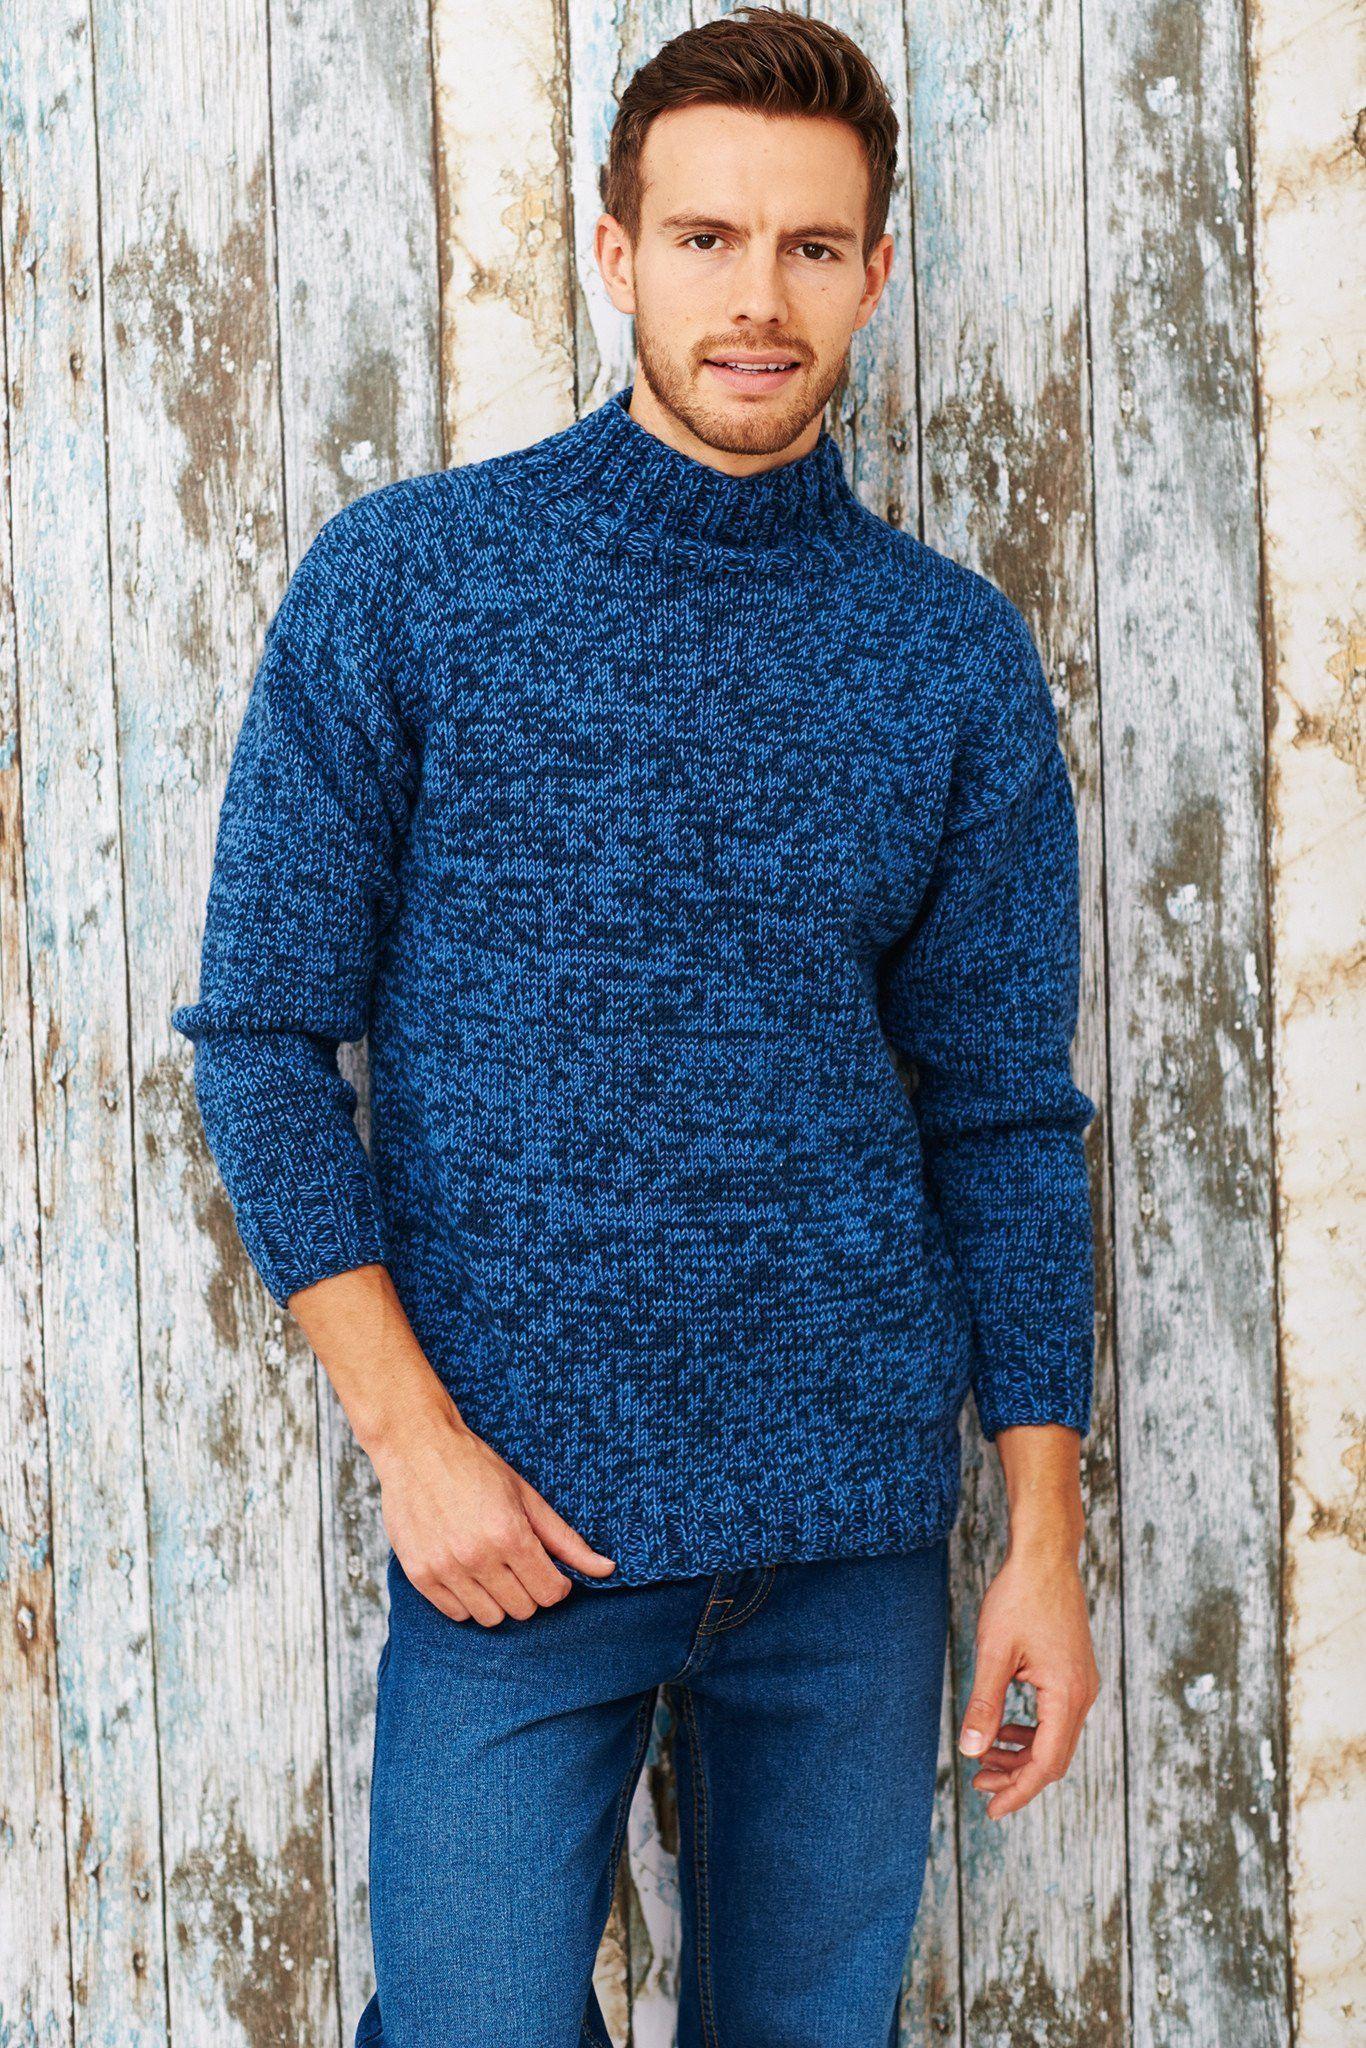 Mens Turtleneck Jumper Knitting Pattern   The Knitting Network